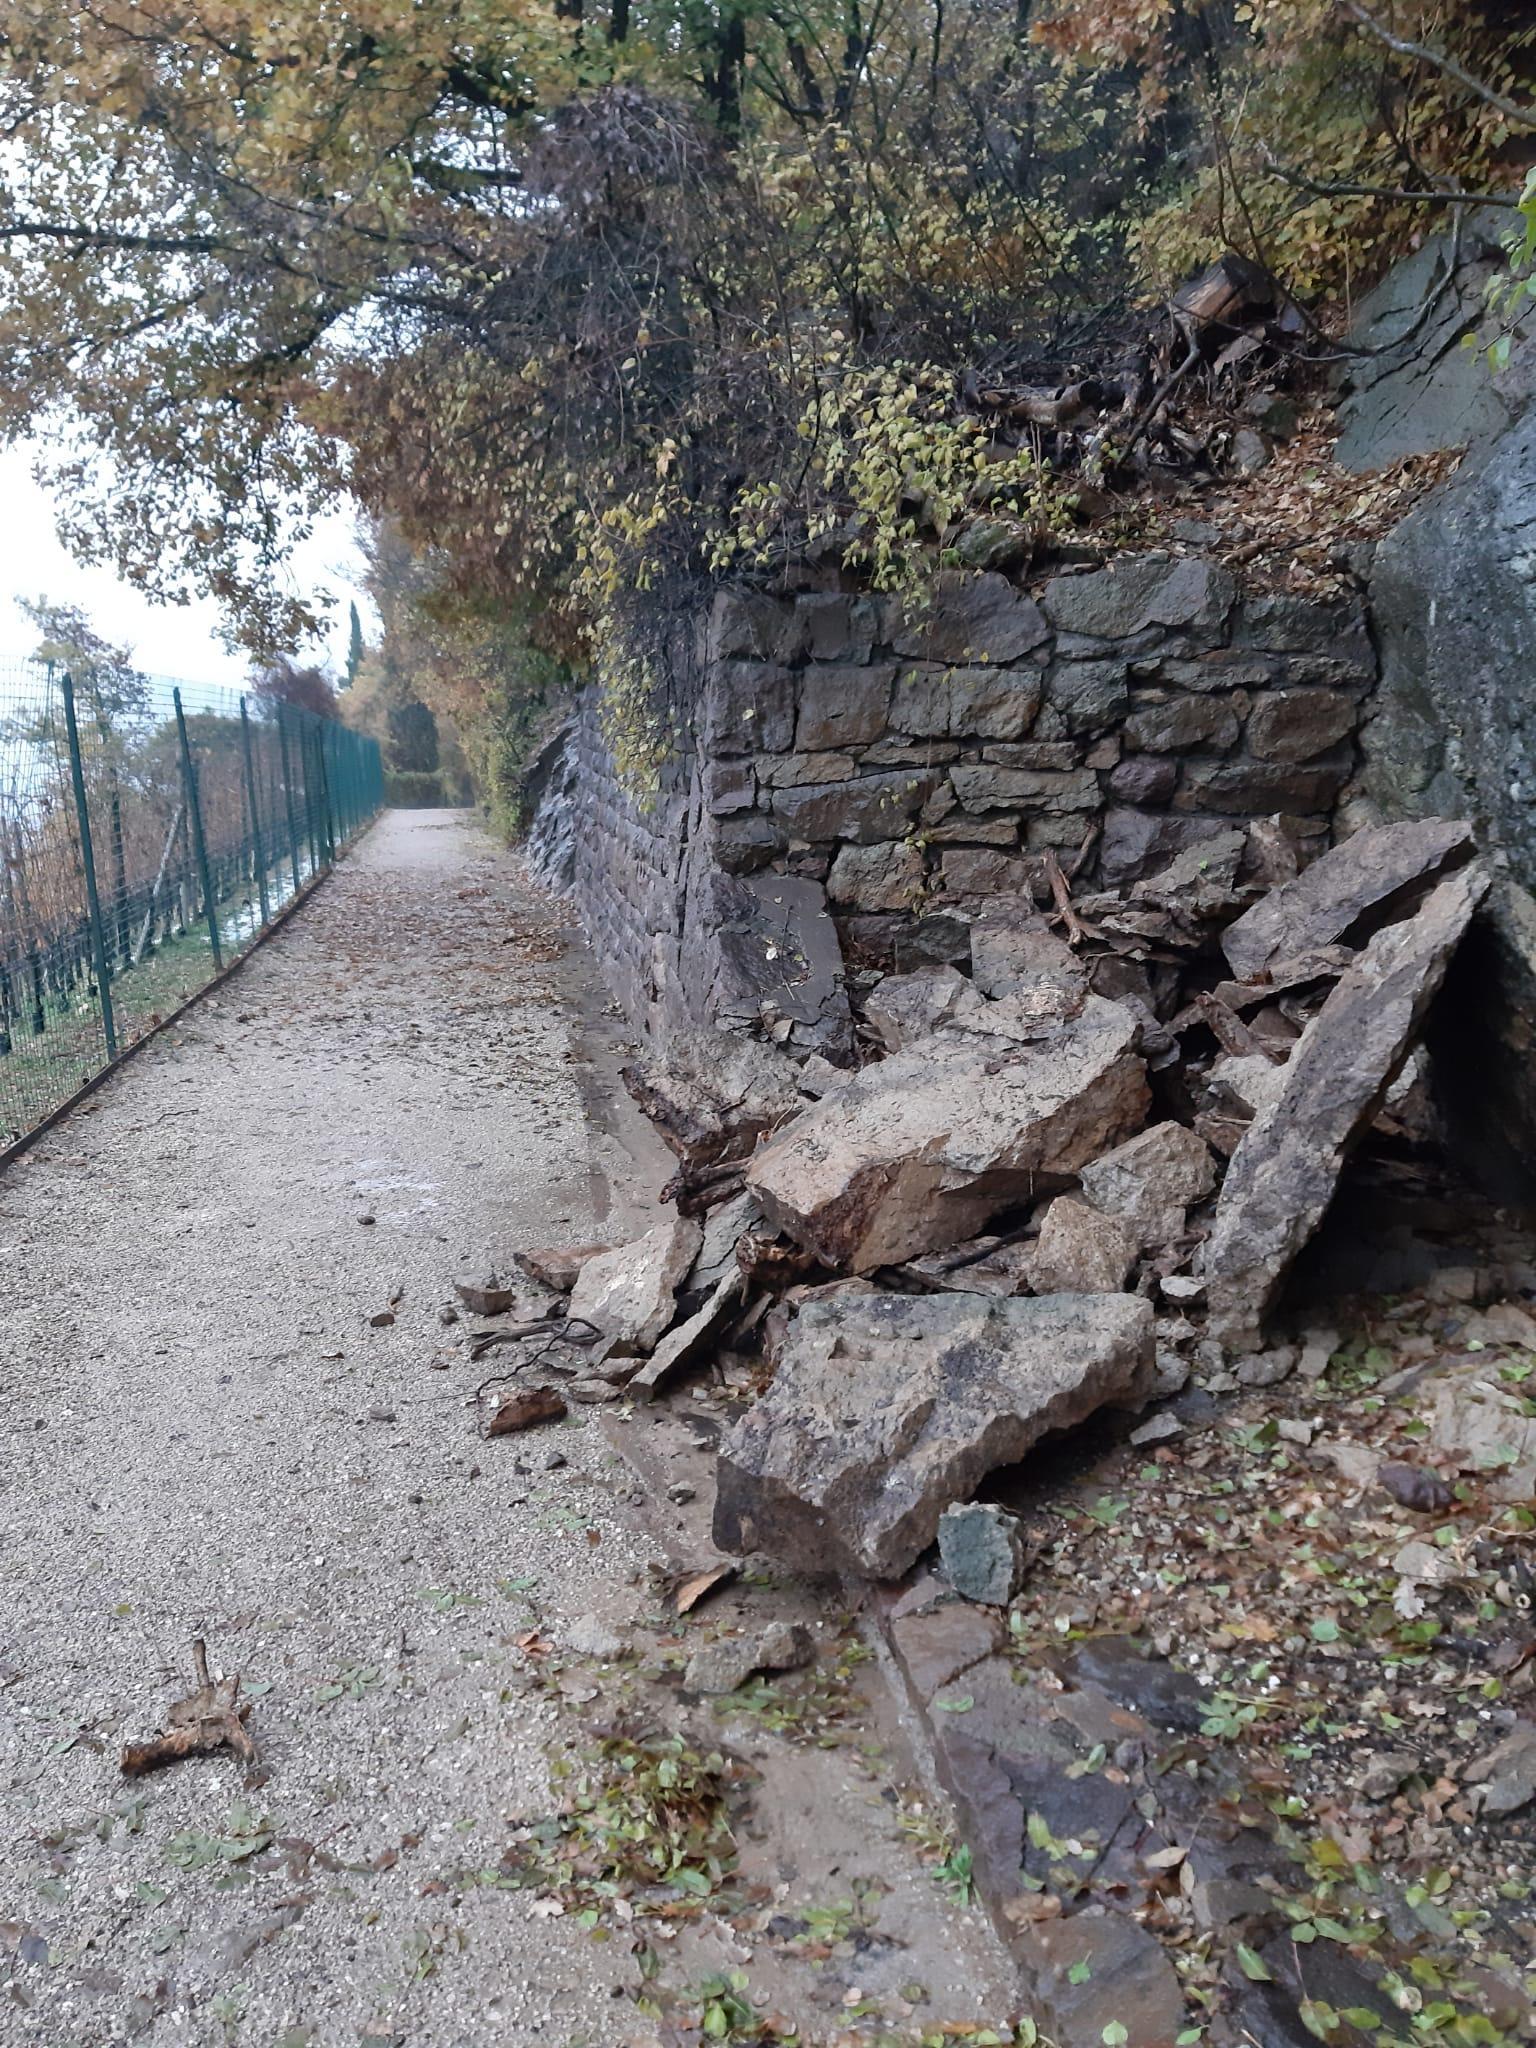 Oswaldpromenade Bozen